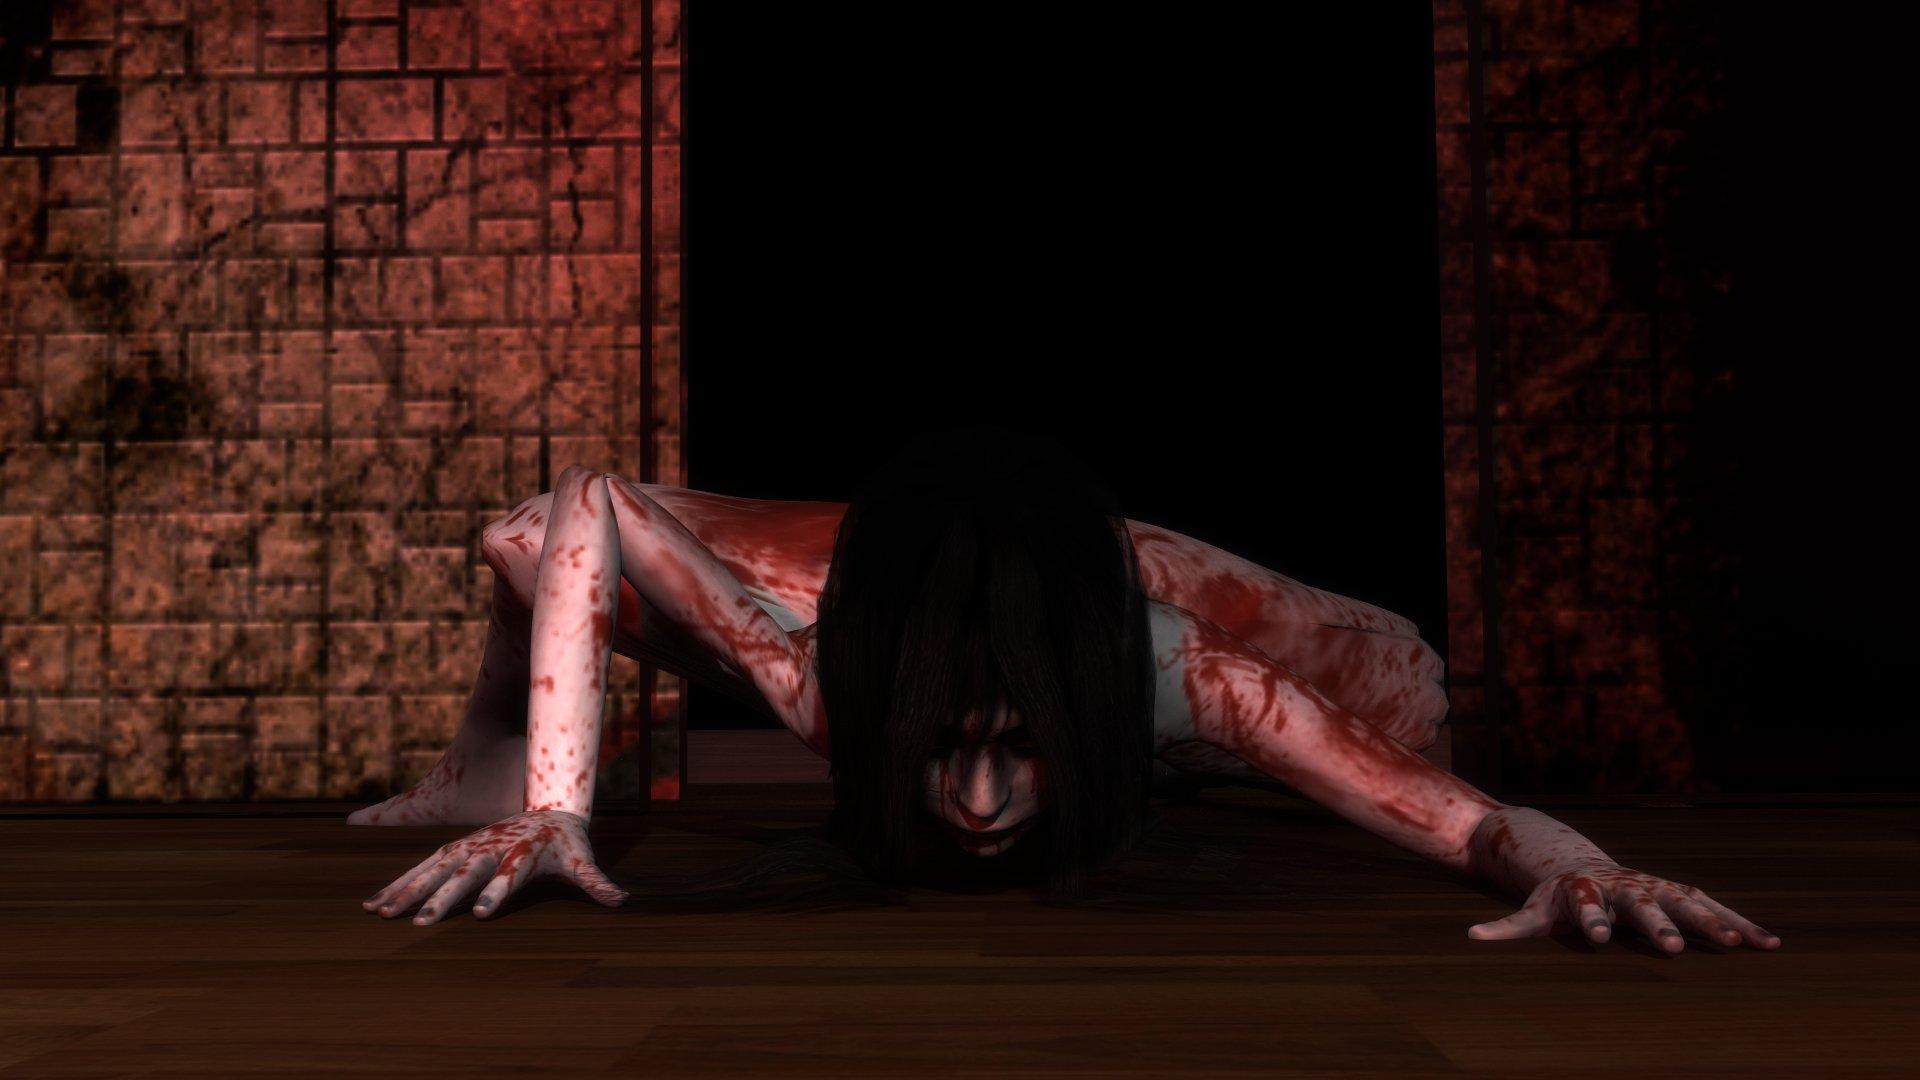 THE,GRUDGE,horror,mystery,thriller,dark,movie,film,the,grudge